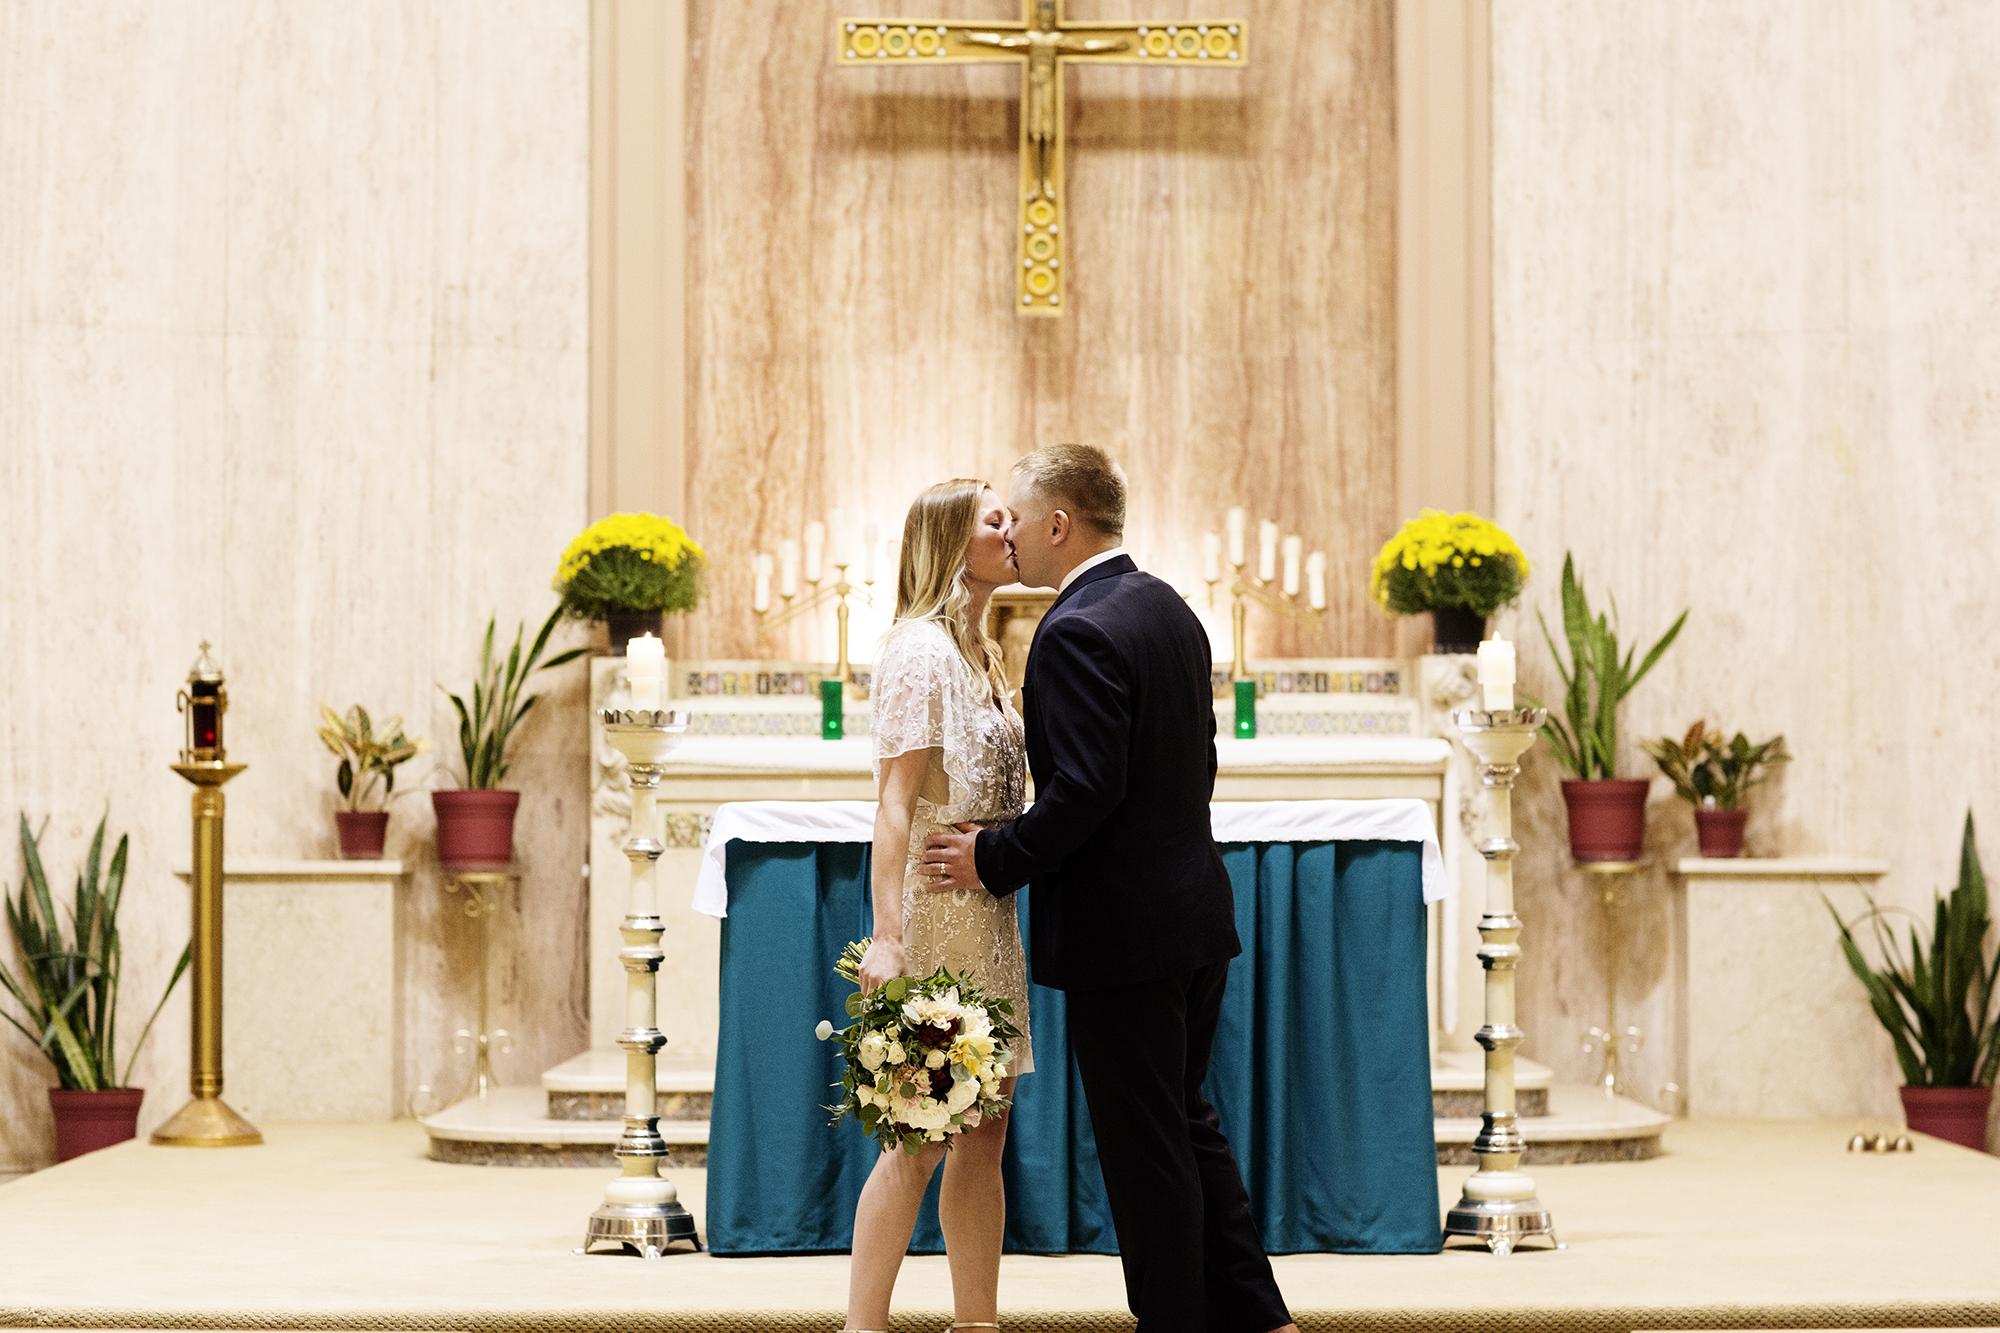 Private Church Ceremony Wedding Photos | Photography by Photogen Inc. | Eliesa Johnson | Based in Minneapolis, Minnesota